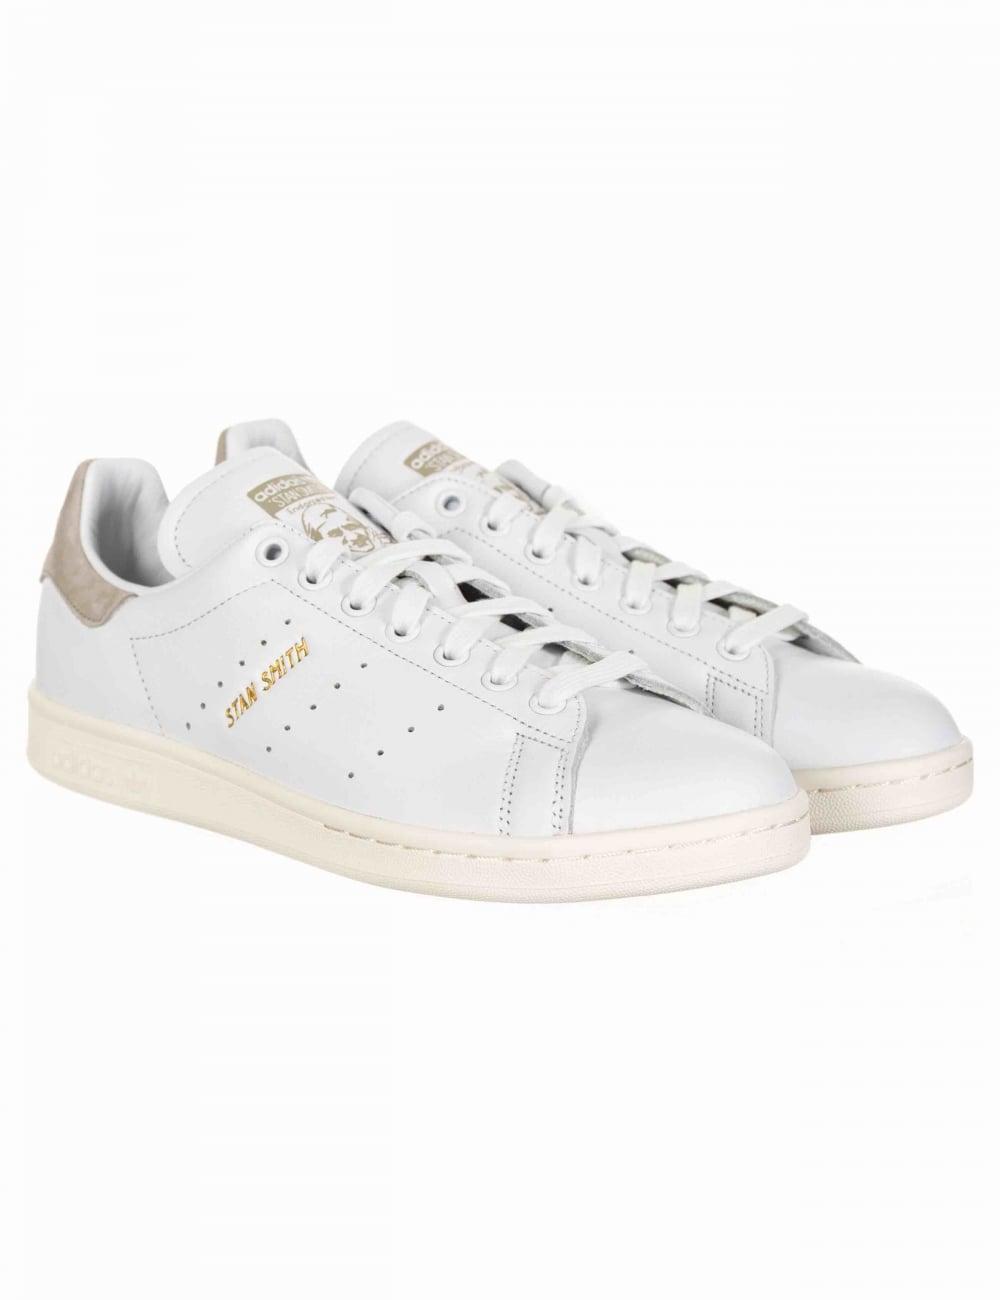 7c64a0e41a1332 Adidas Originals Stan Smith Shoes - Footwear White Vintage White ...